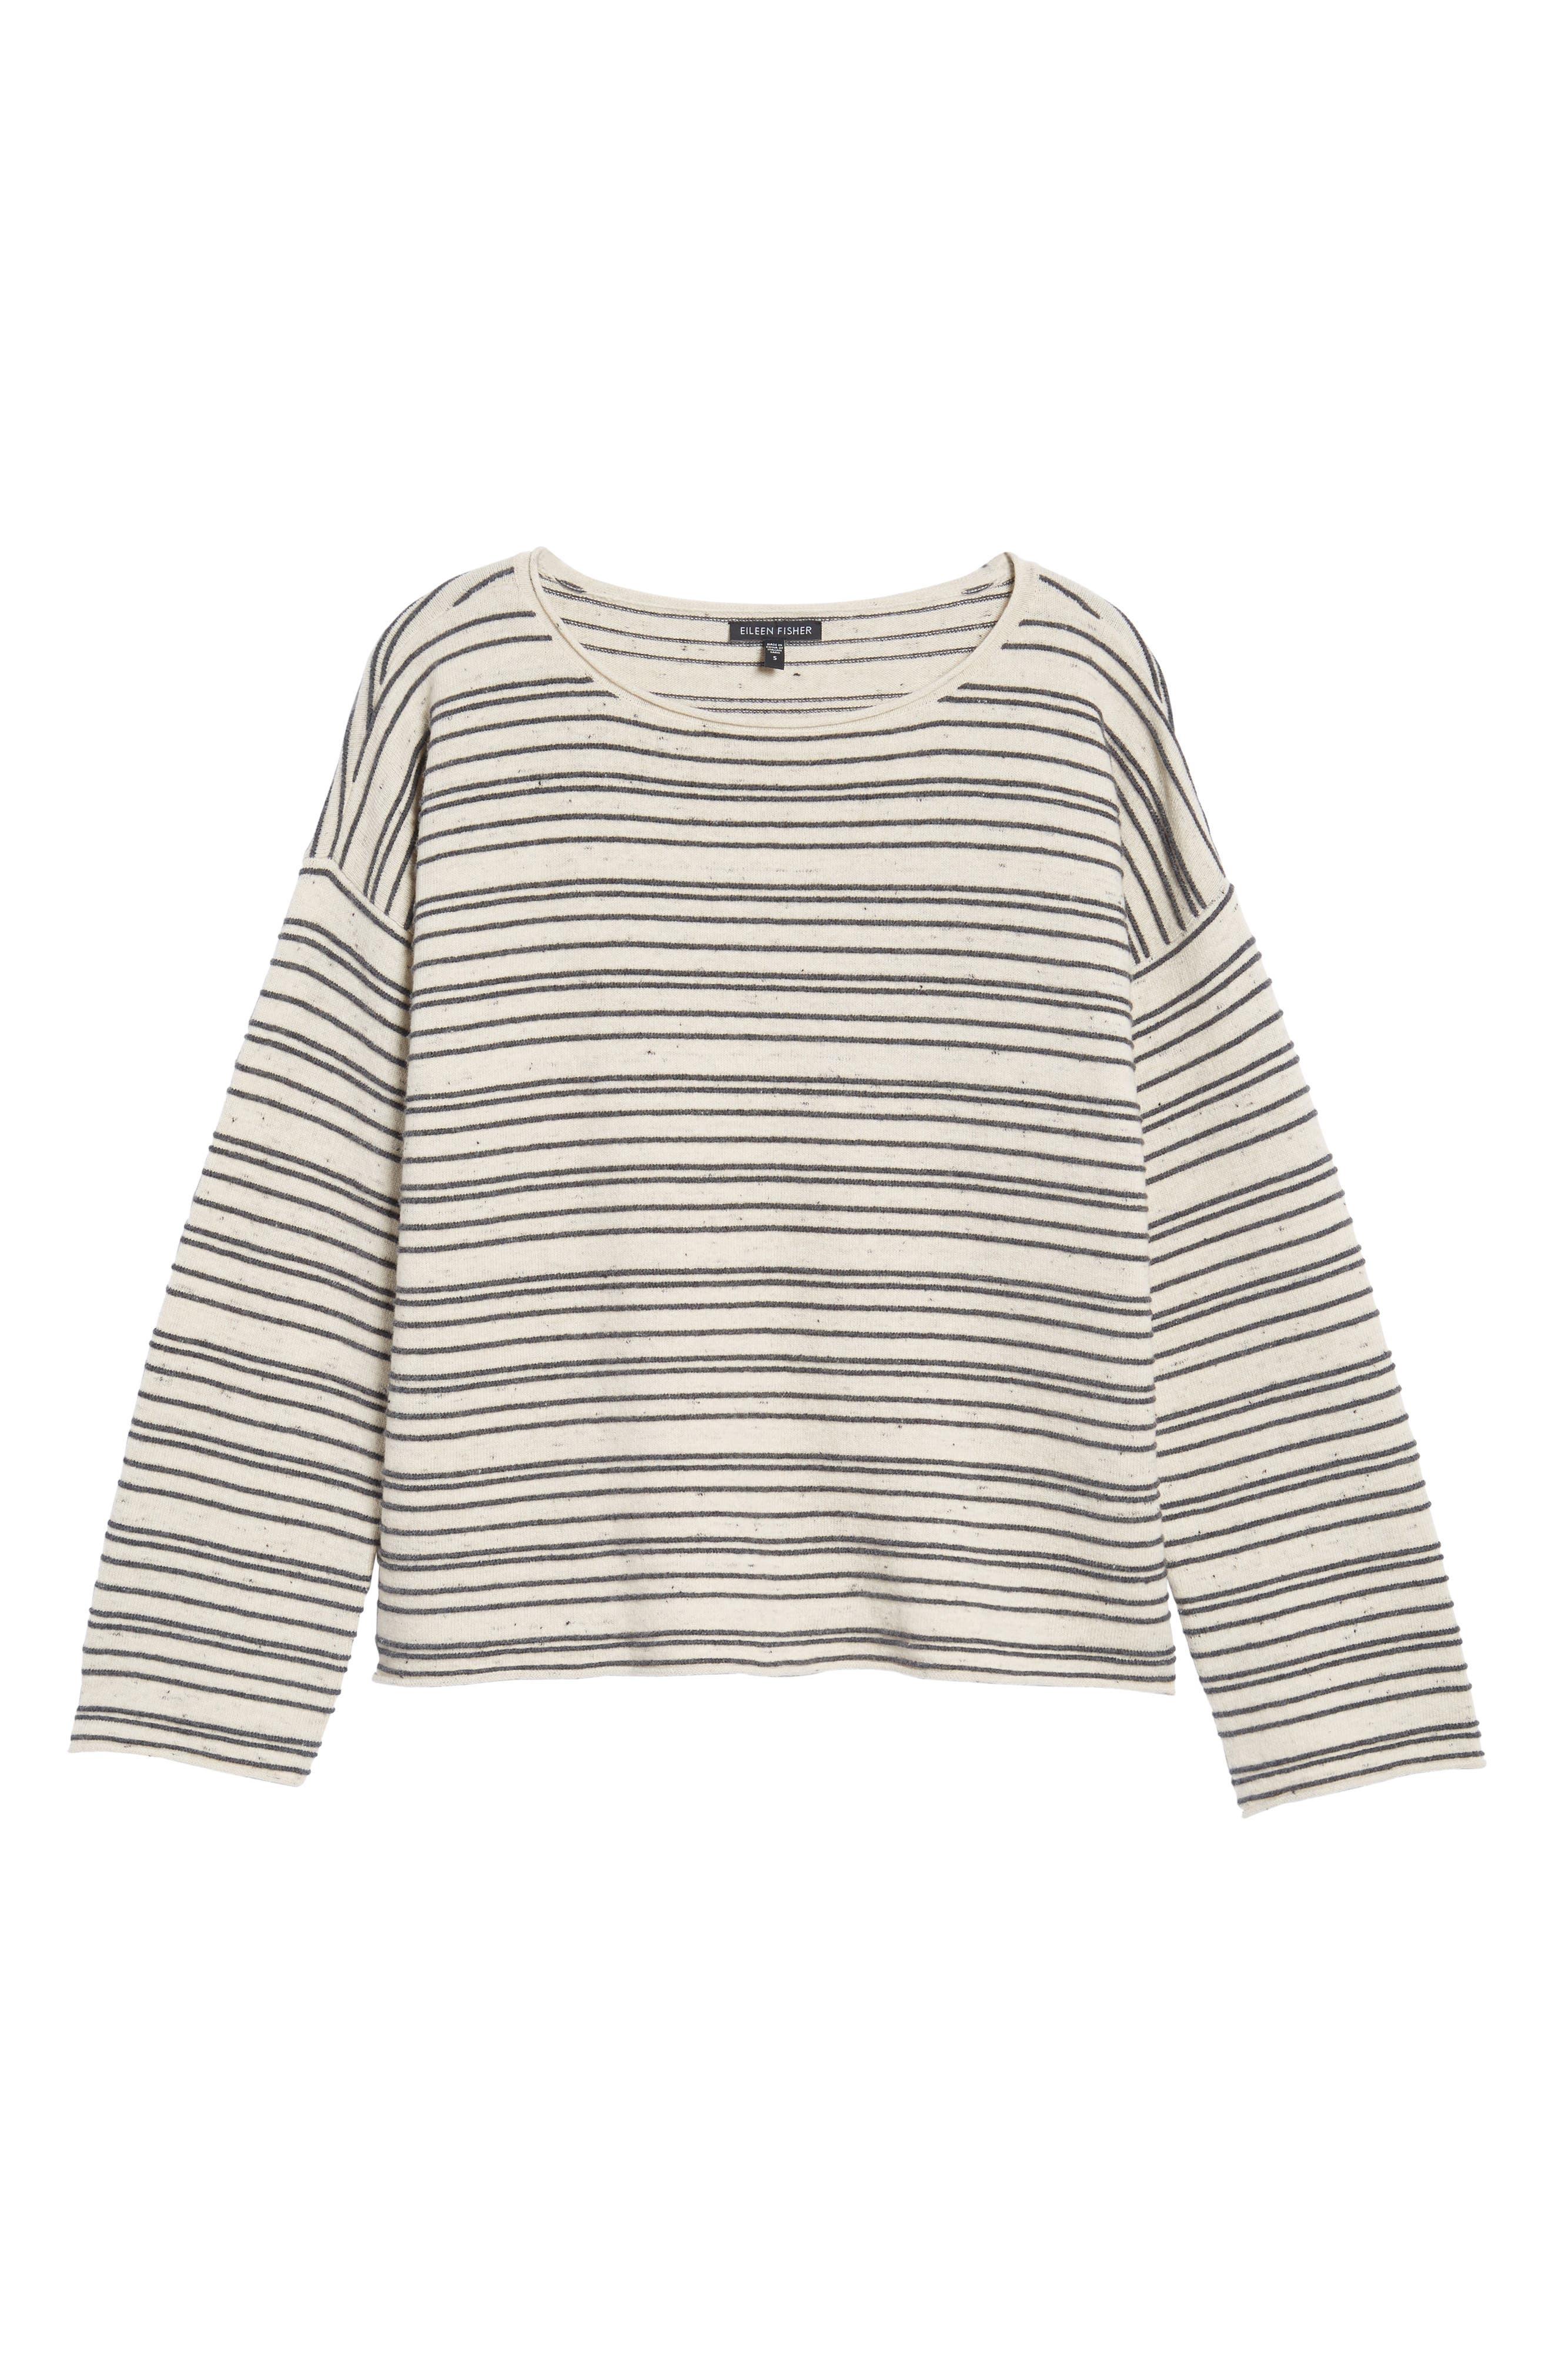 Stripe Organic Cotton Blend Sweater,                             Alternate thumbnail 6, color,                             Maple Oat